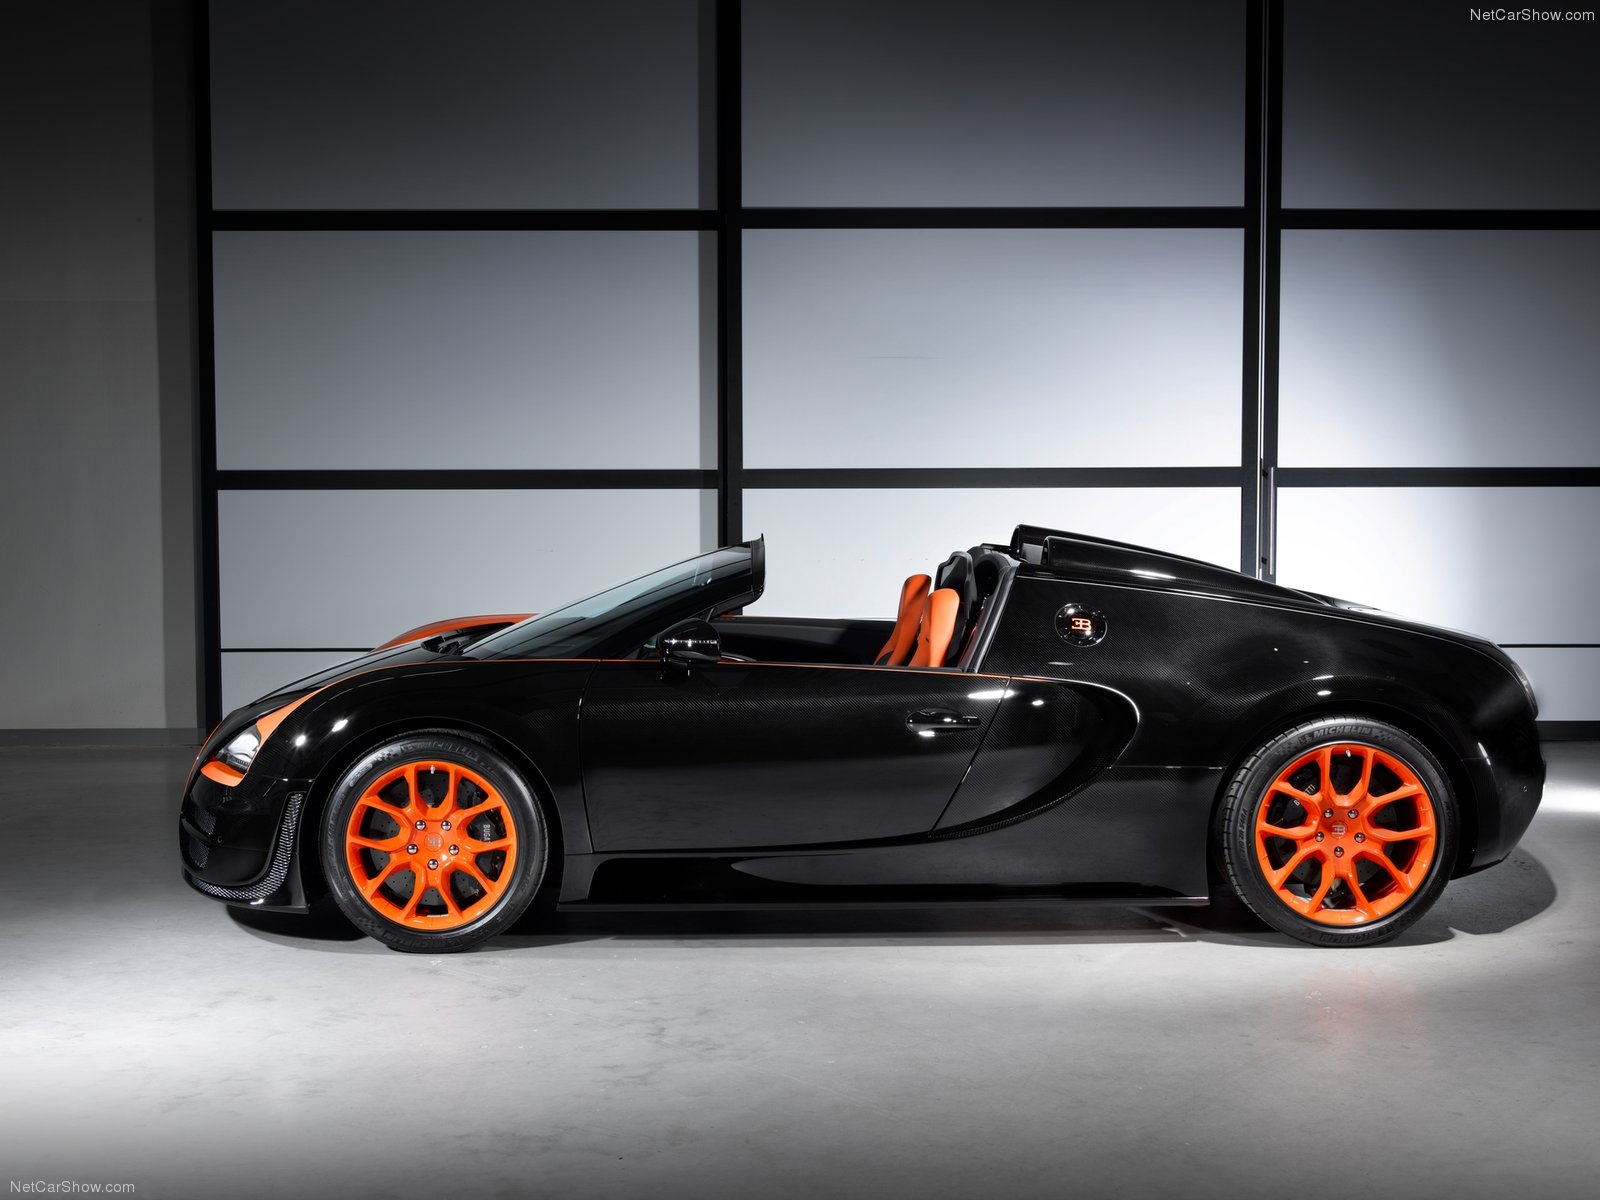 2013%2BBugatti%2BVeyron%2BGrand%2BSport%2BVitesse%2BWRC%2B%25283%2529 Astounding Xe Bugatti Veyron Grand Sport Vitesse Cars Trend